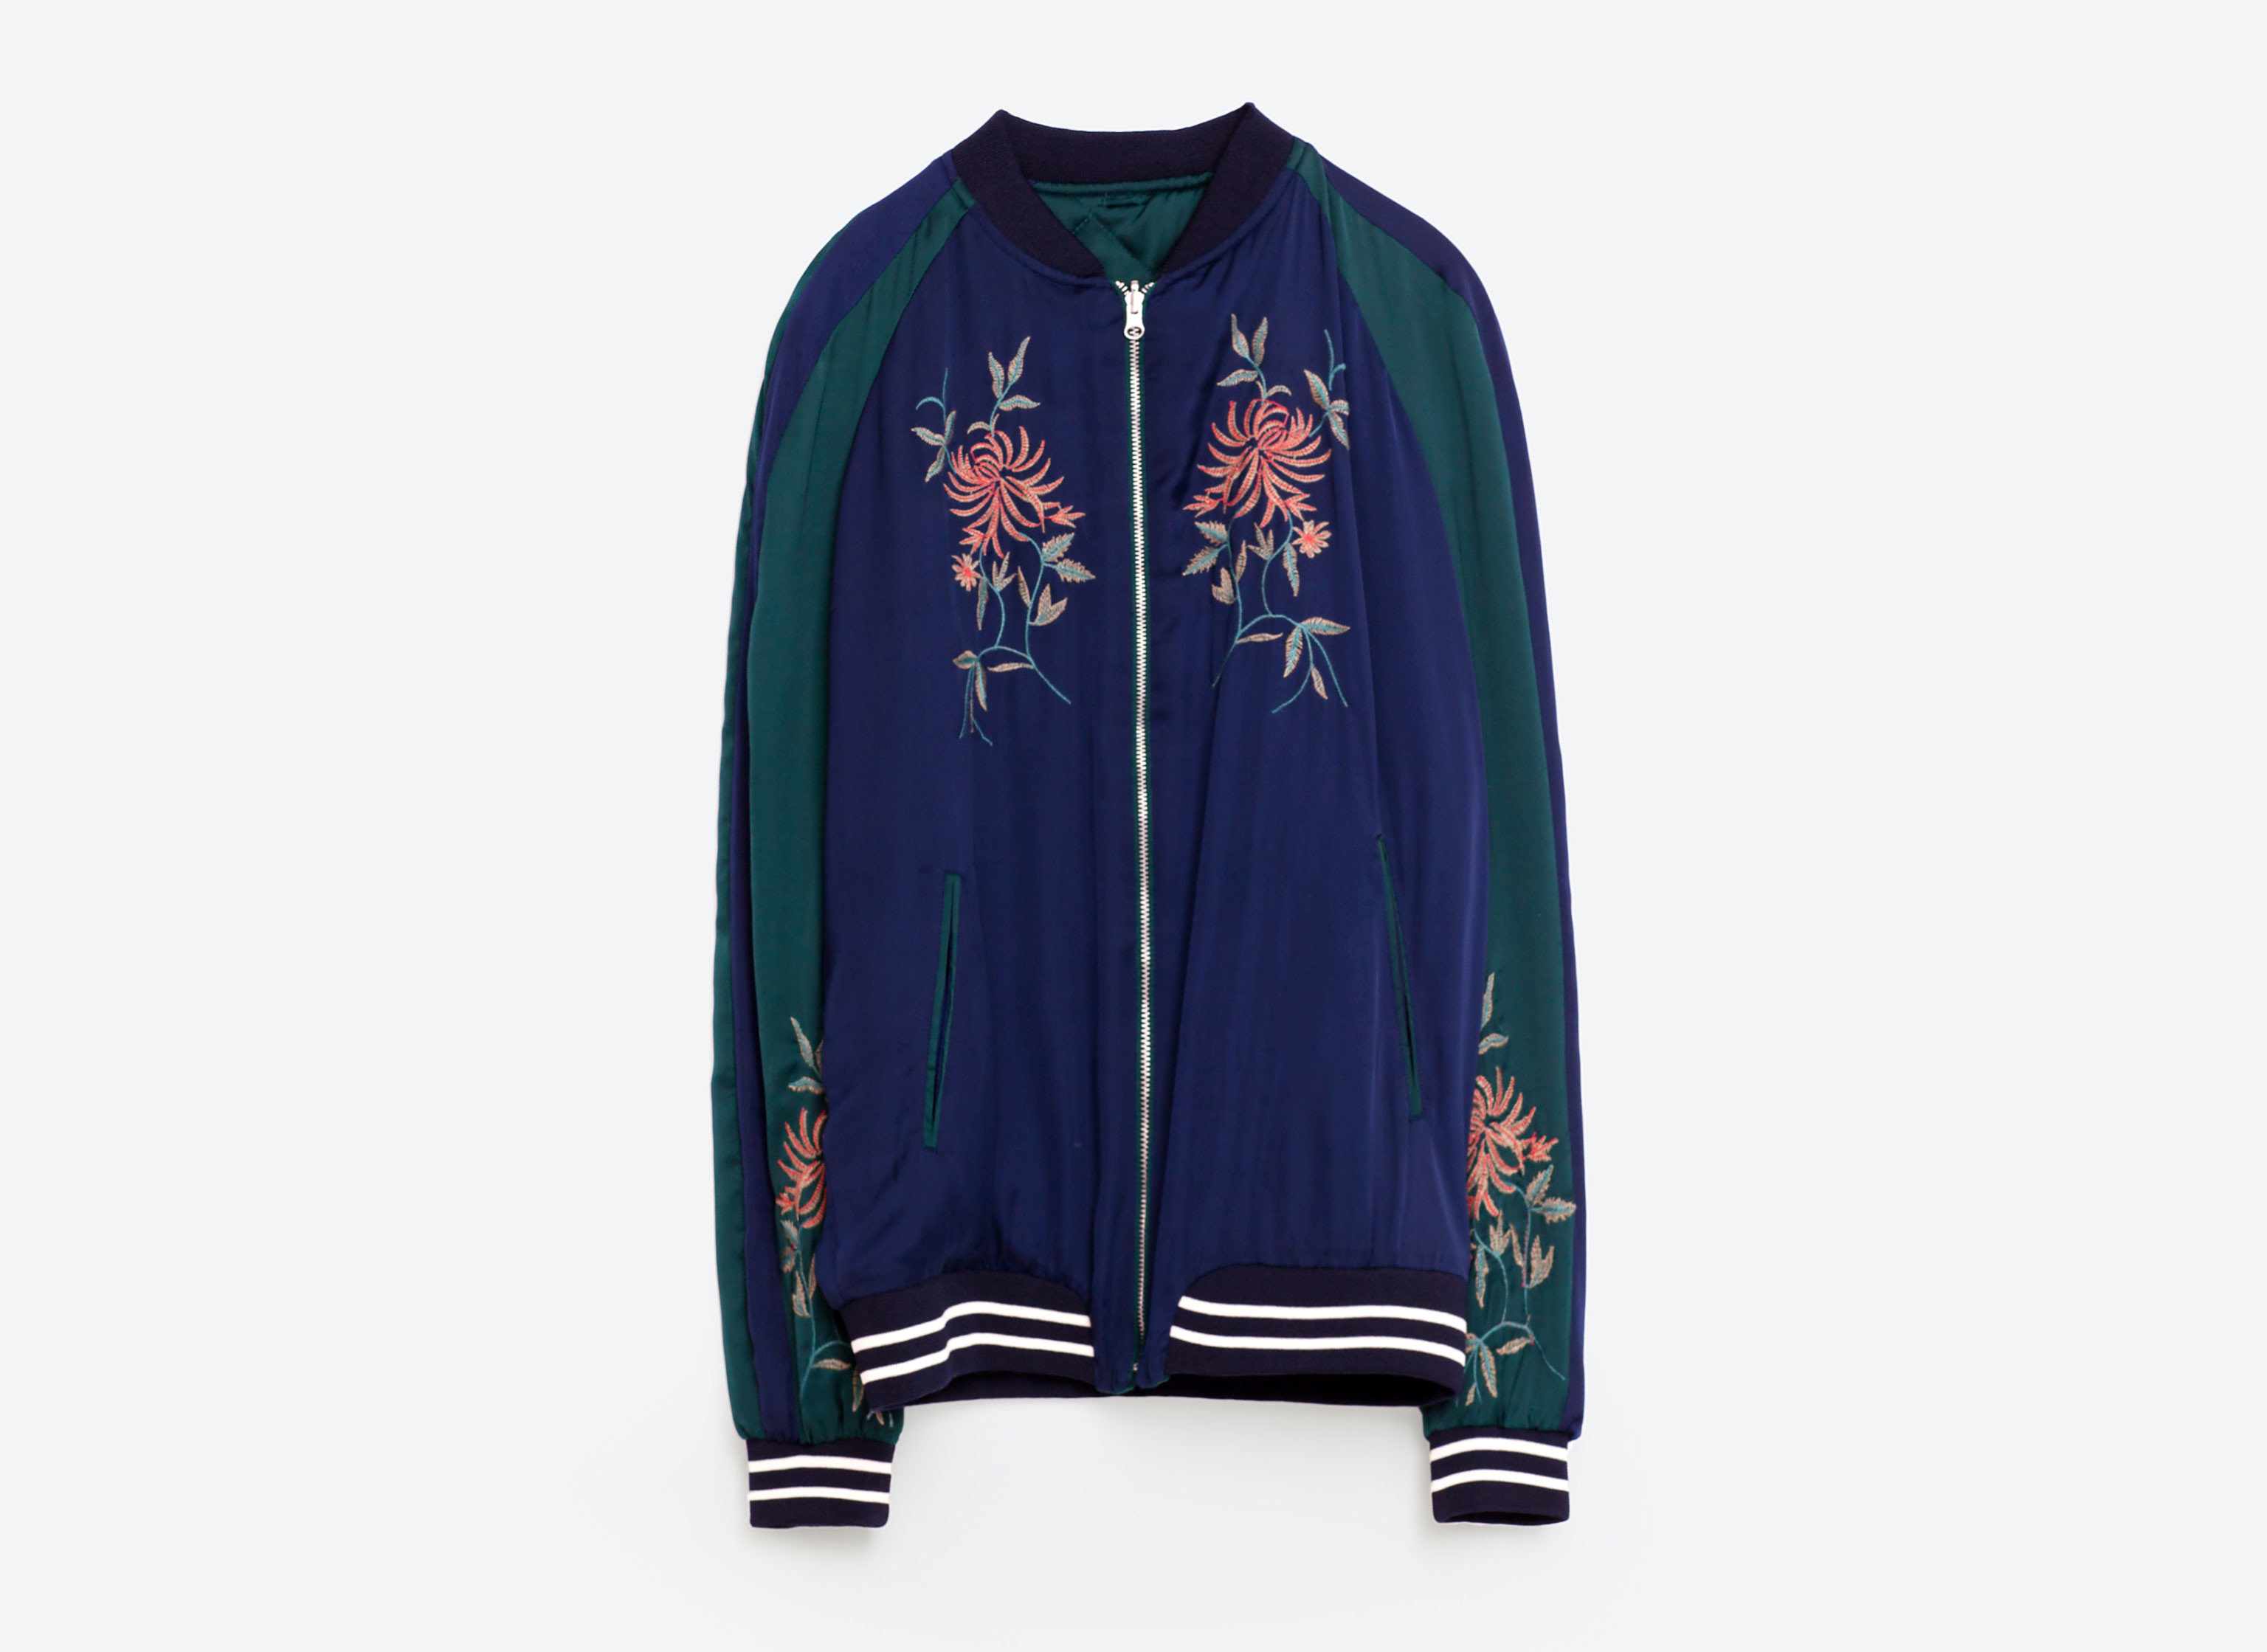 Offbeat clothing blue sleeve outerwear jacket t shirt brand shirt textile